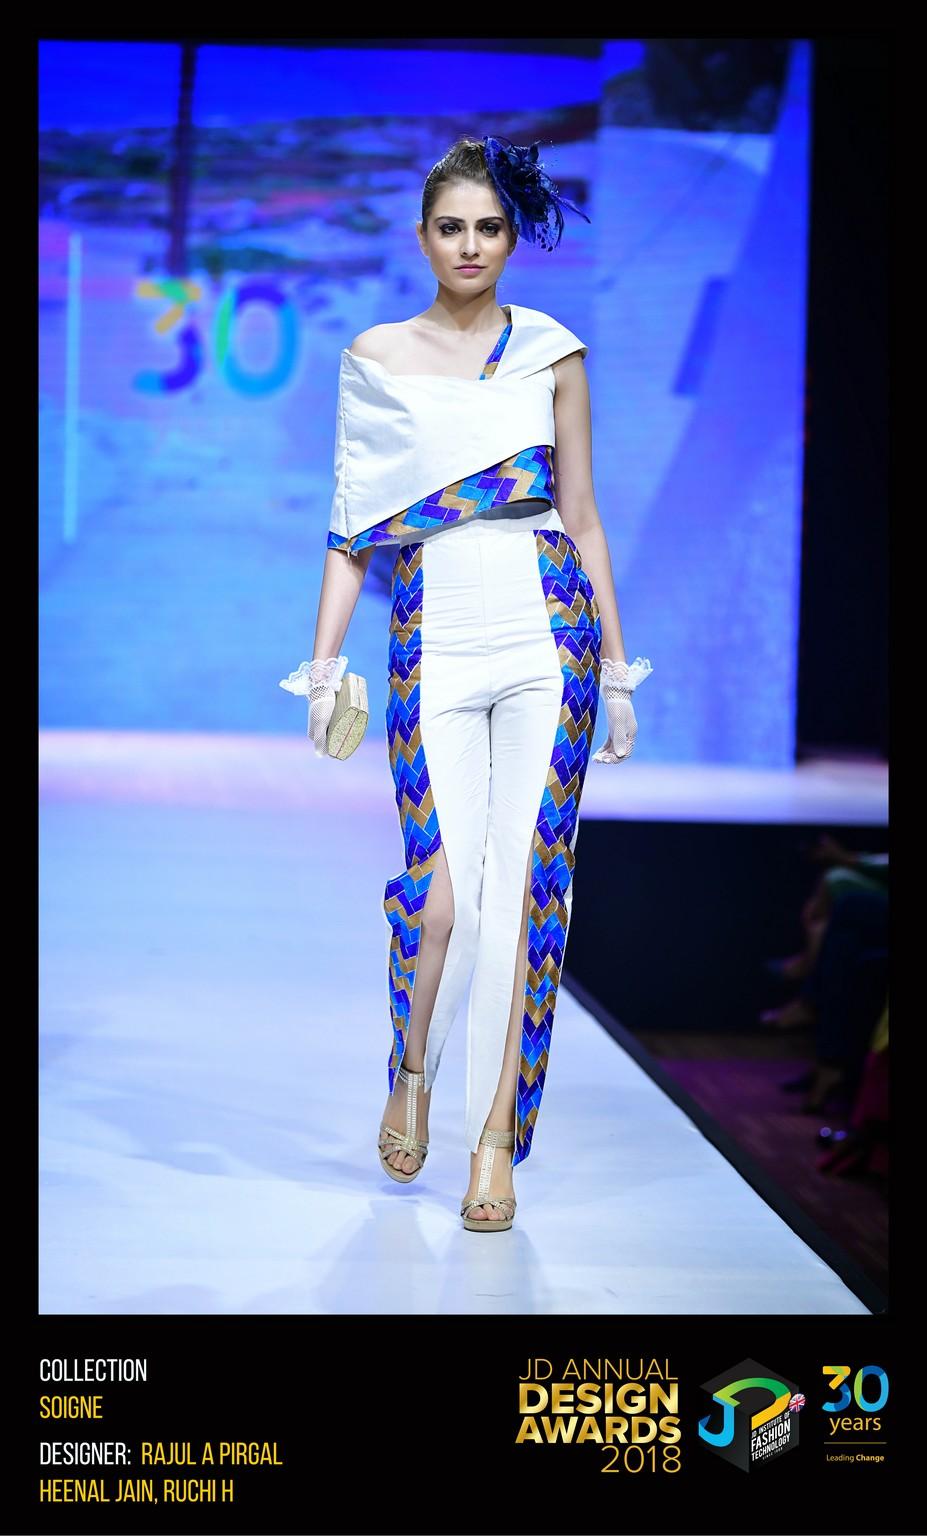 Soigne – Change – JD Annual Design Awards 2018 | Designer: Rajul, Heena and Ruchi | Photography : Jerin Nath (@jerin_nath) soigne – change – jd annual design awards 2018 Soigne – Change – JD Annual Design Awards 2018 SOIGNE 5